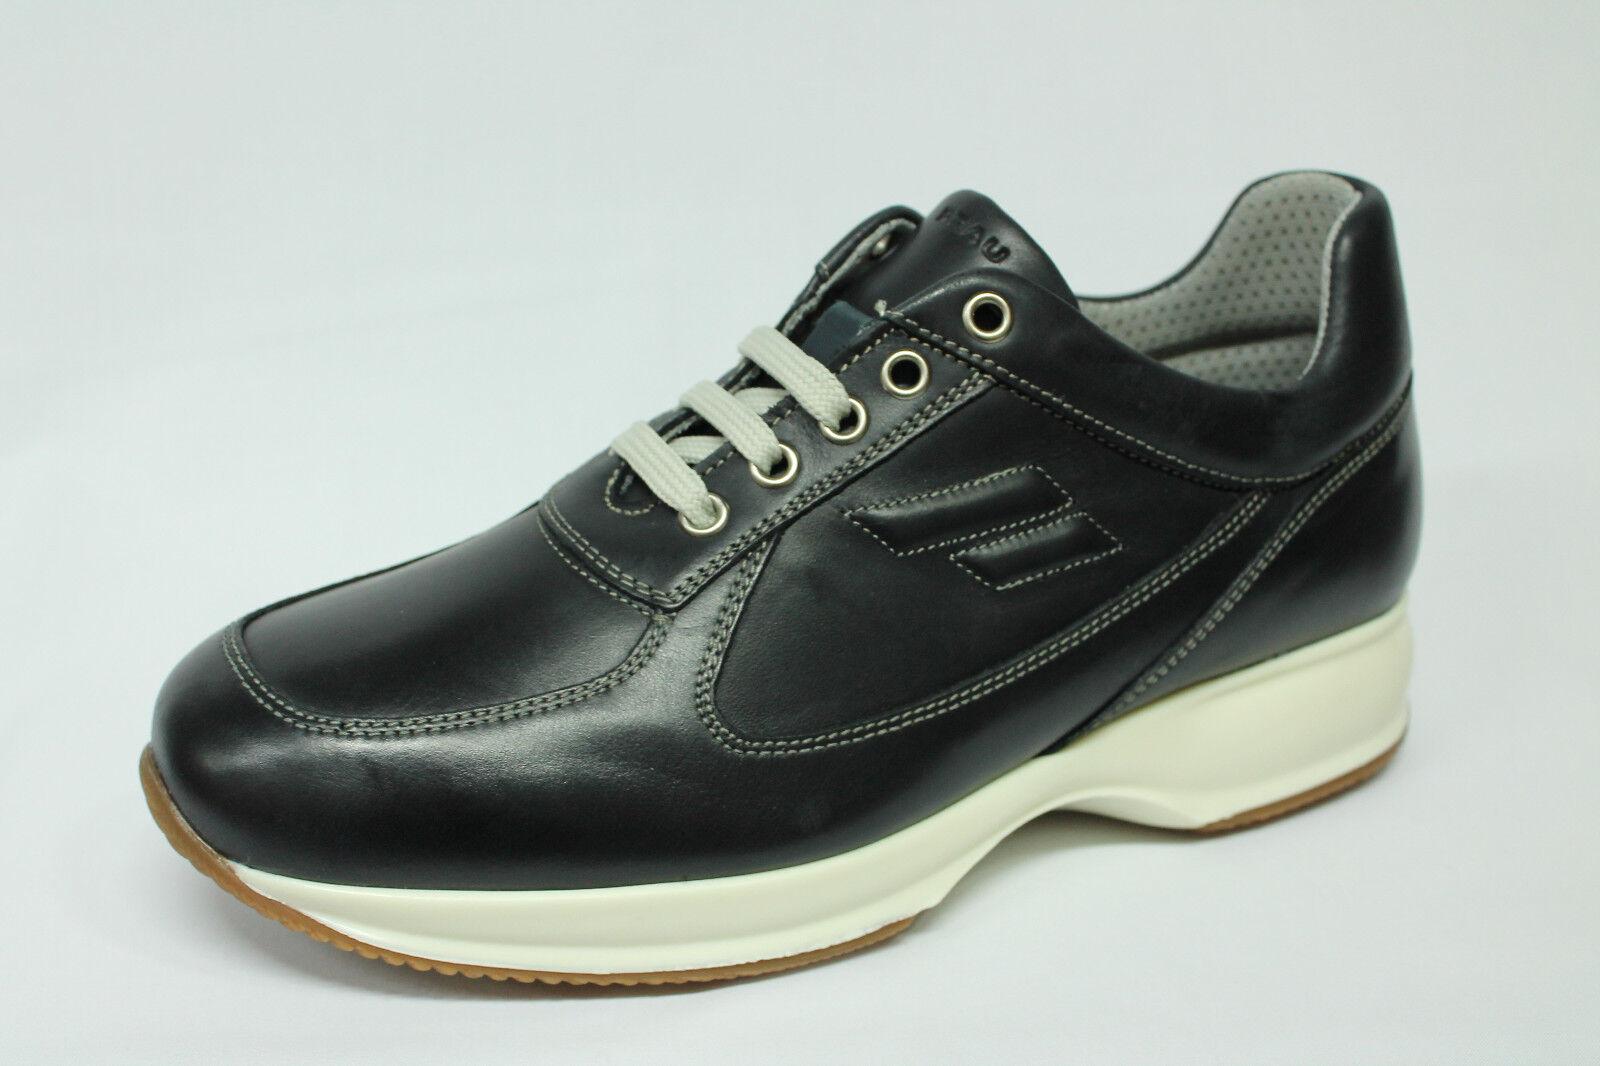 Sneakers Hogan Frau 24L3/24N3 blu tipo Hogan Sneakers Interactive listino135 - 20% 034cab